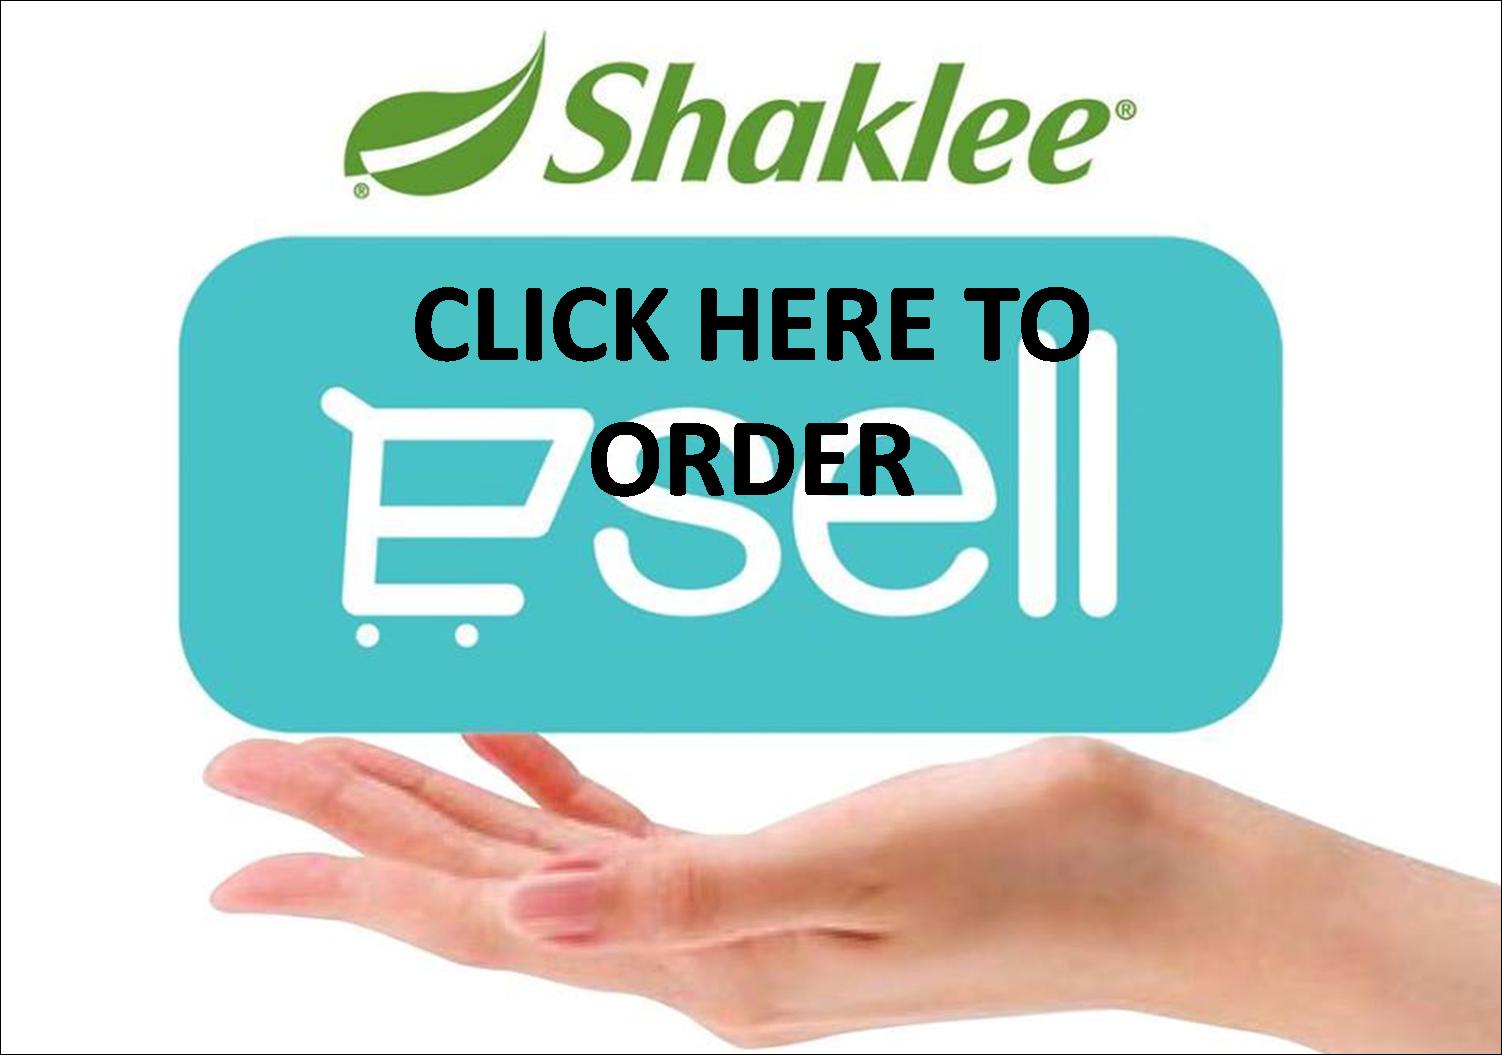 https://www.shaklee2u.com.my/widget/widget_agreement.php?session_id=&enc_widget_id=aec5e966a73ebdef615d3ea493d23c86